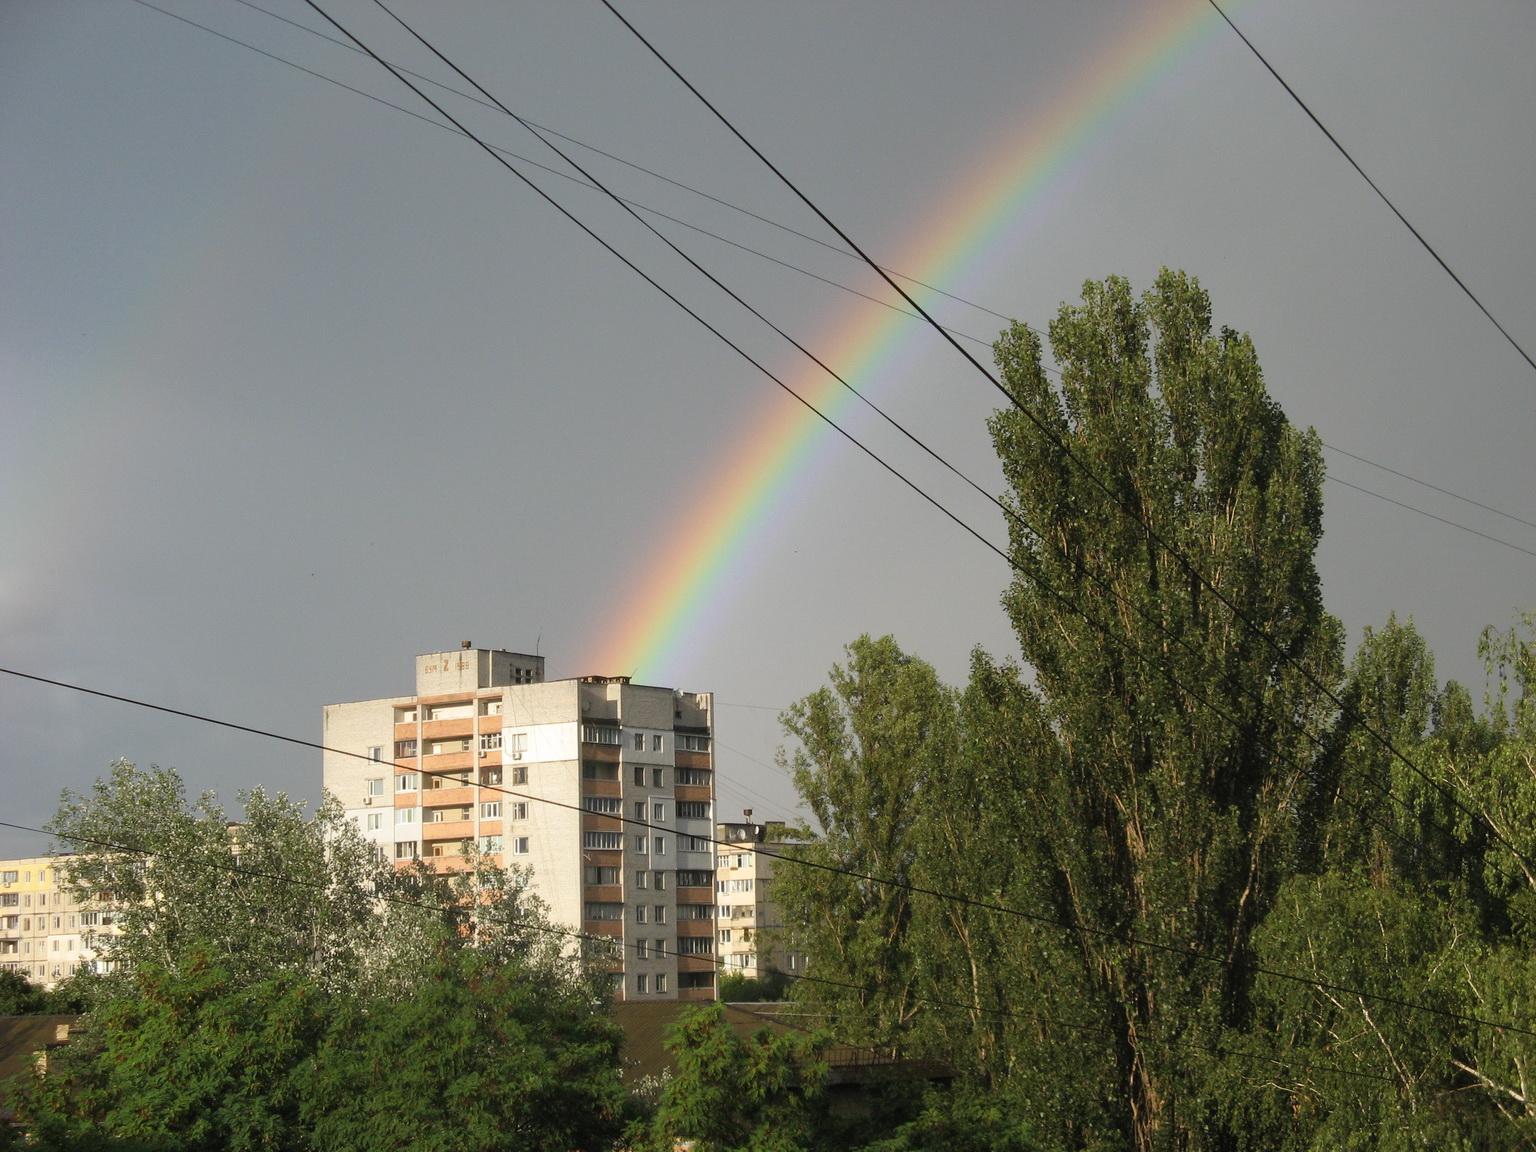 rainbow-03_resize